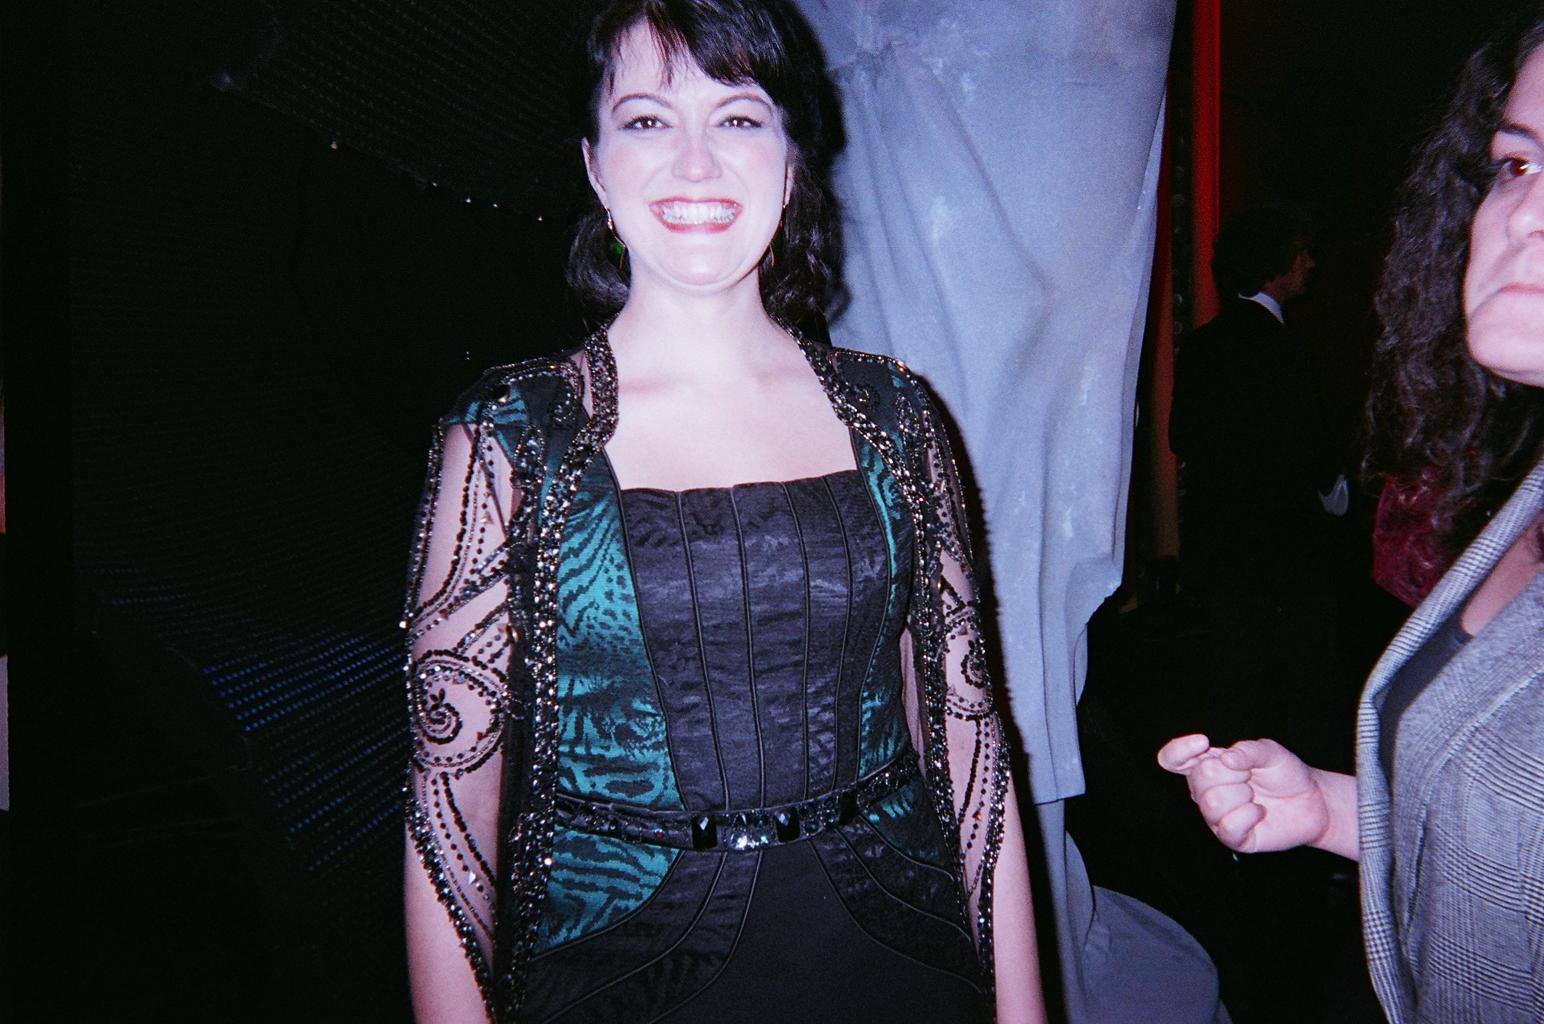 Irene Candelier